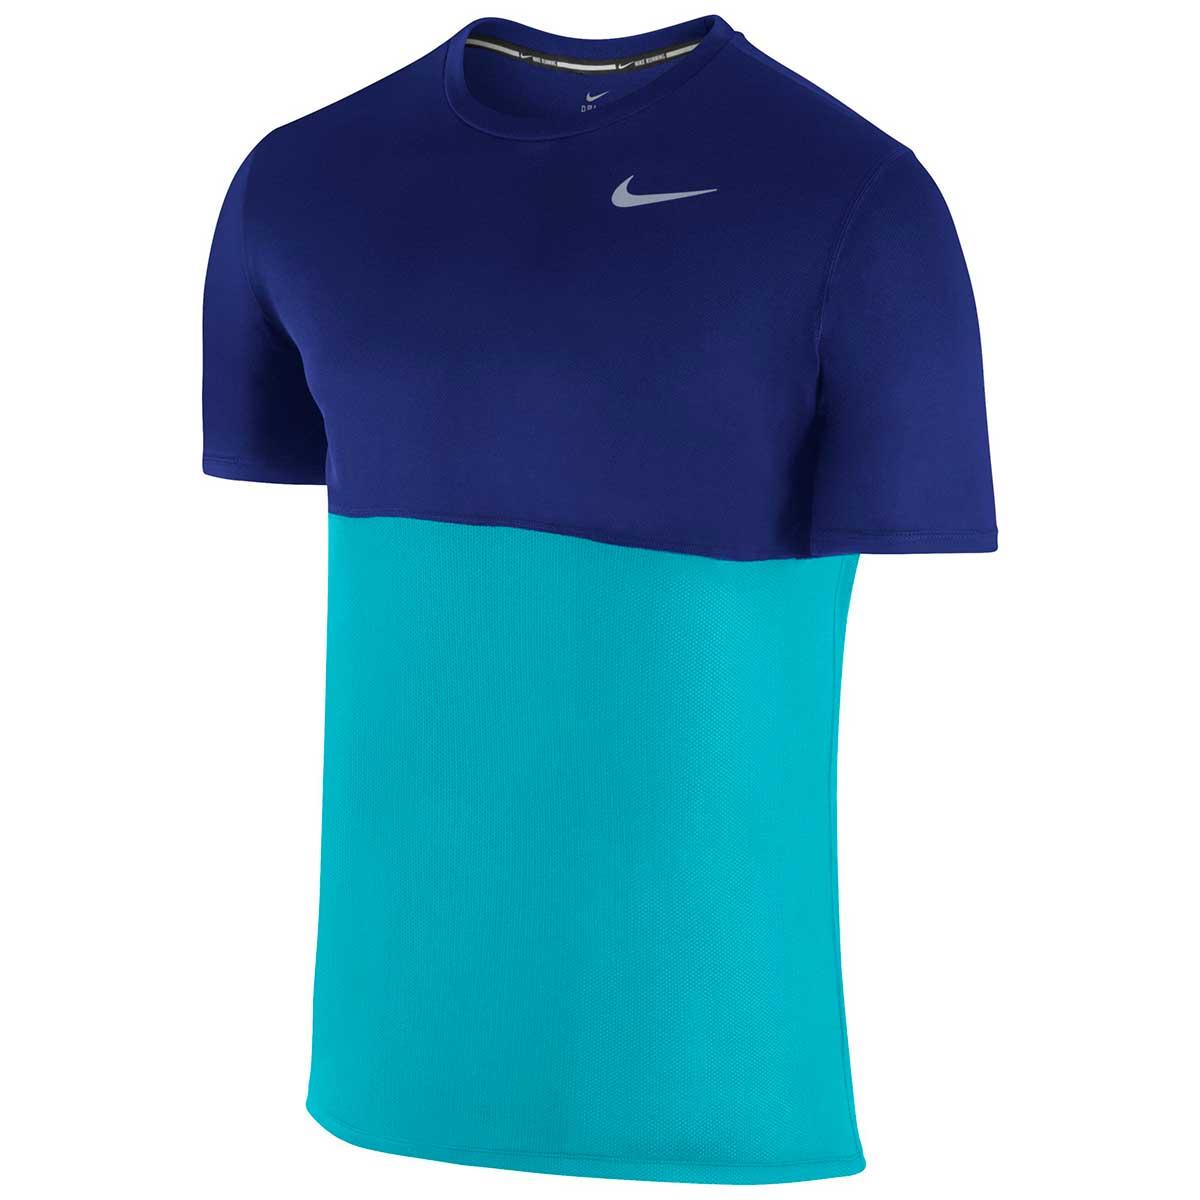 34f3da83ad0d Buy Nike Men s Dri-Fit Running T-Shirt (Blue) Online in India